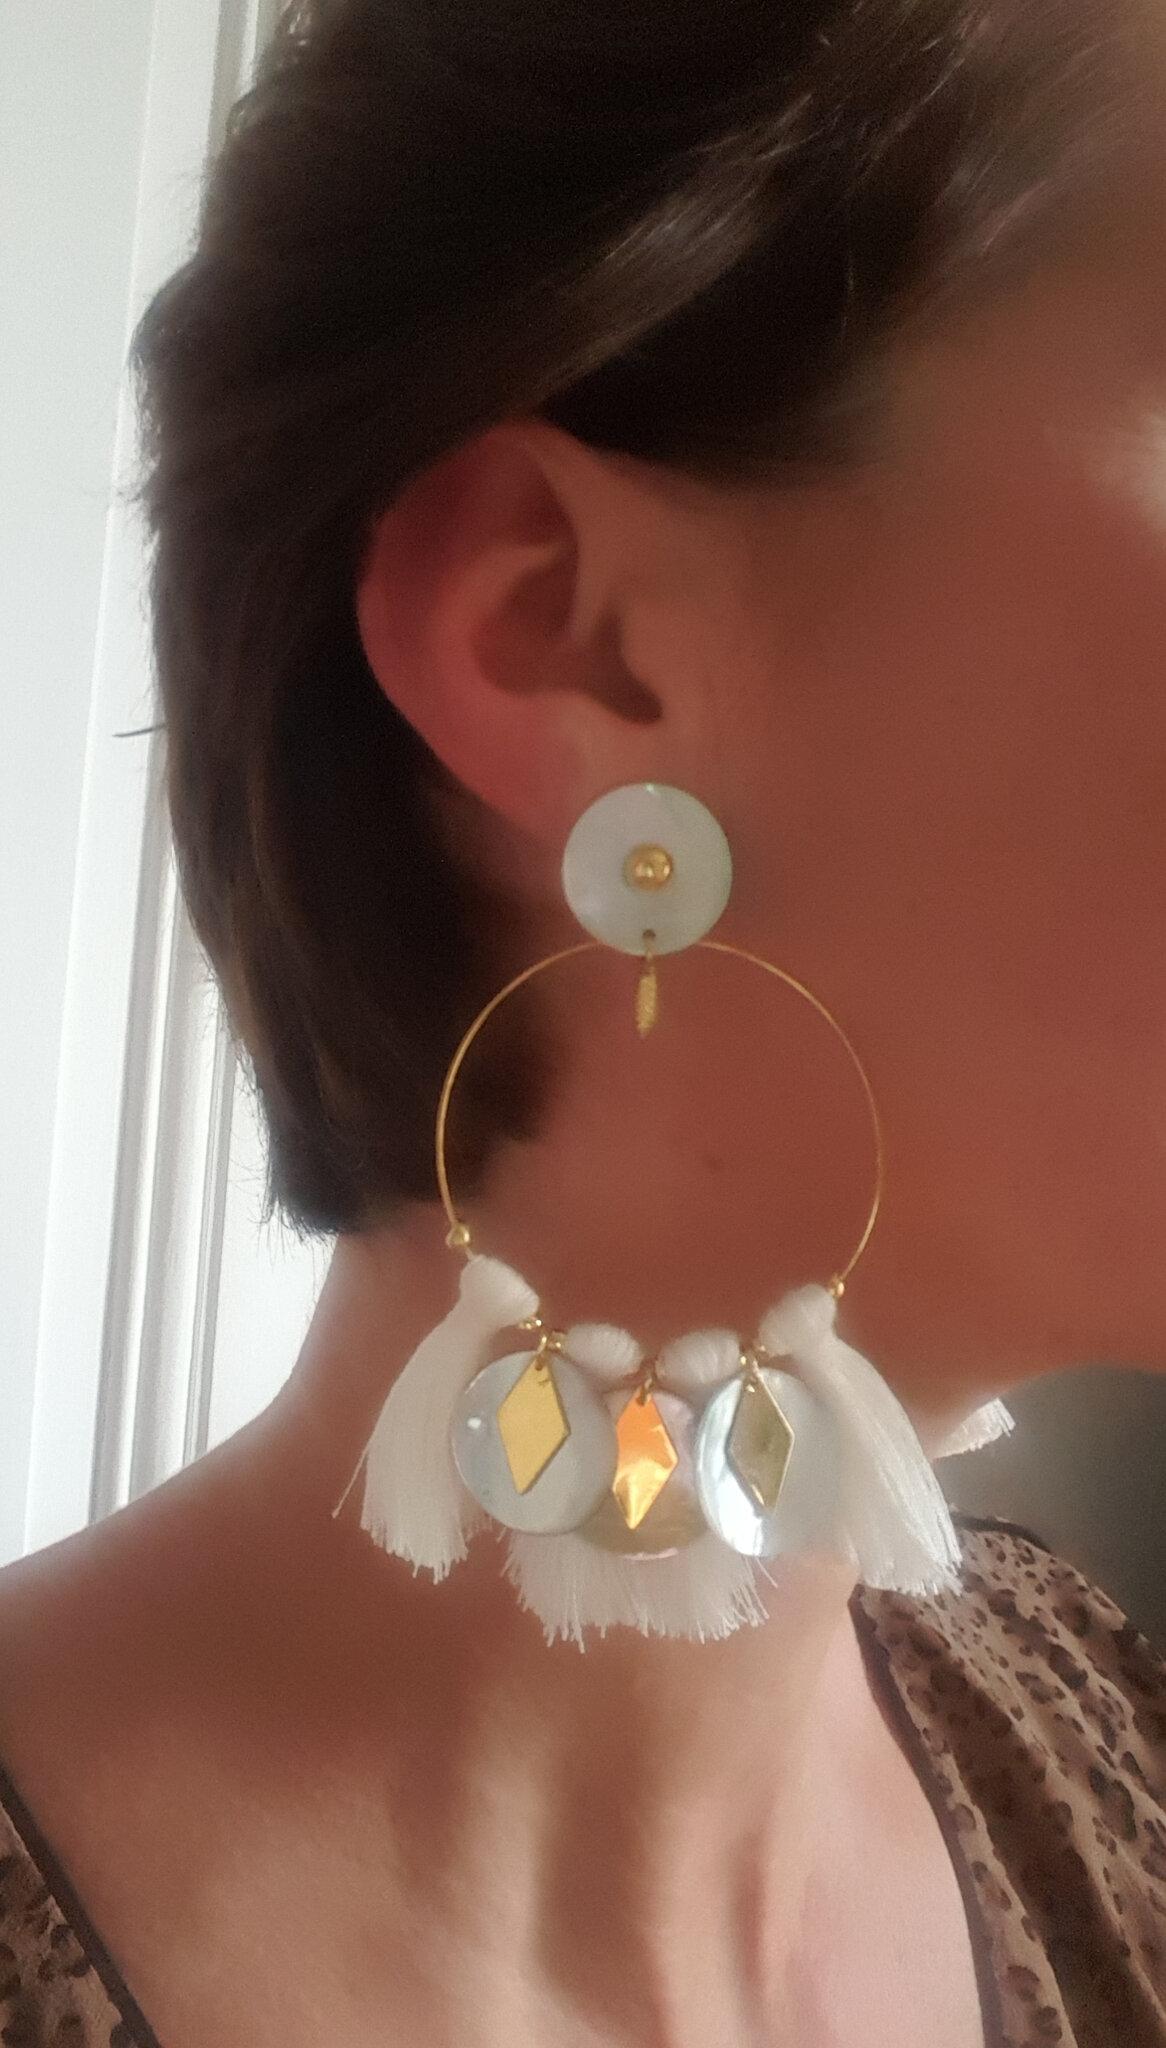 BO Guénola (doré et blanc) portées - 41 € clip ou oreilles percées